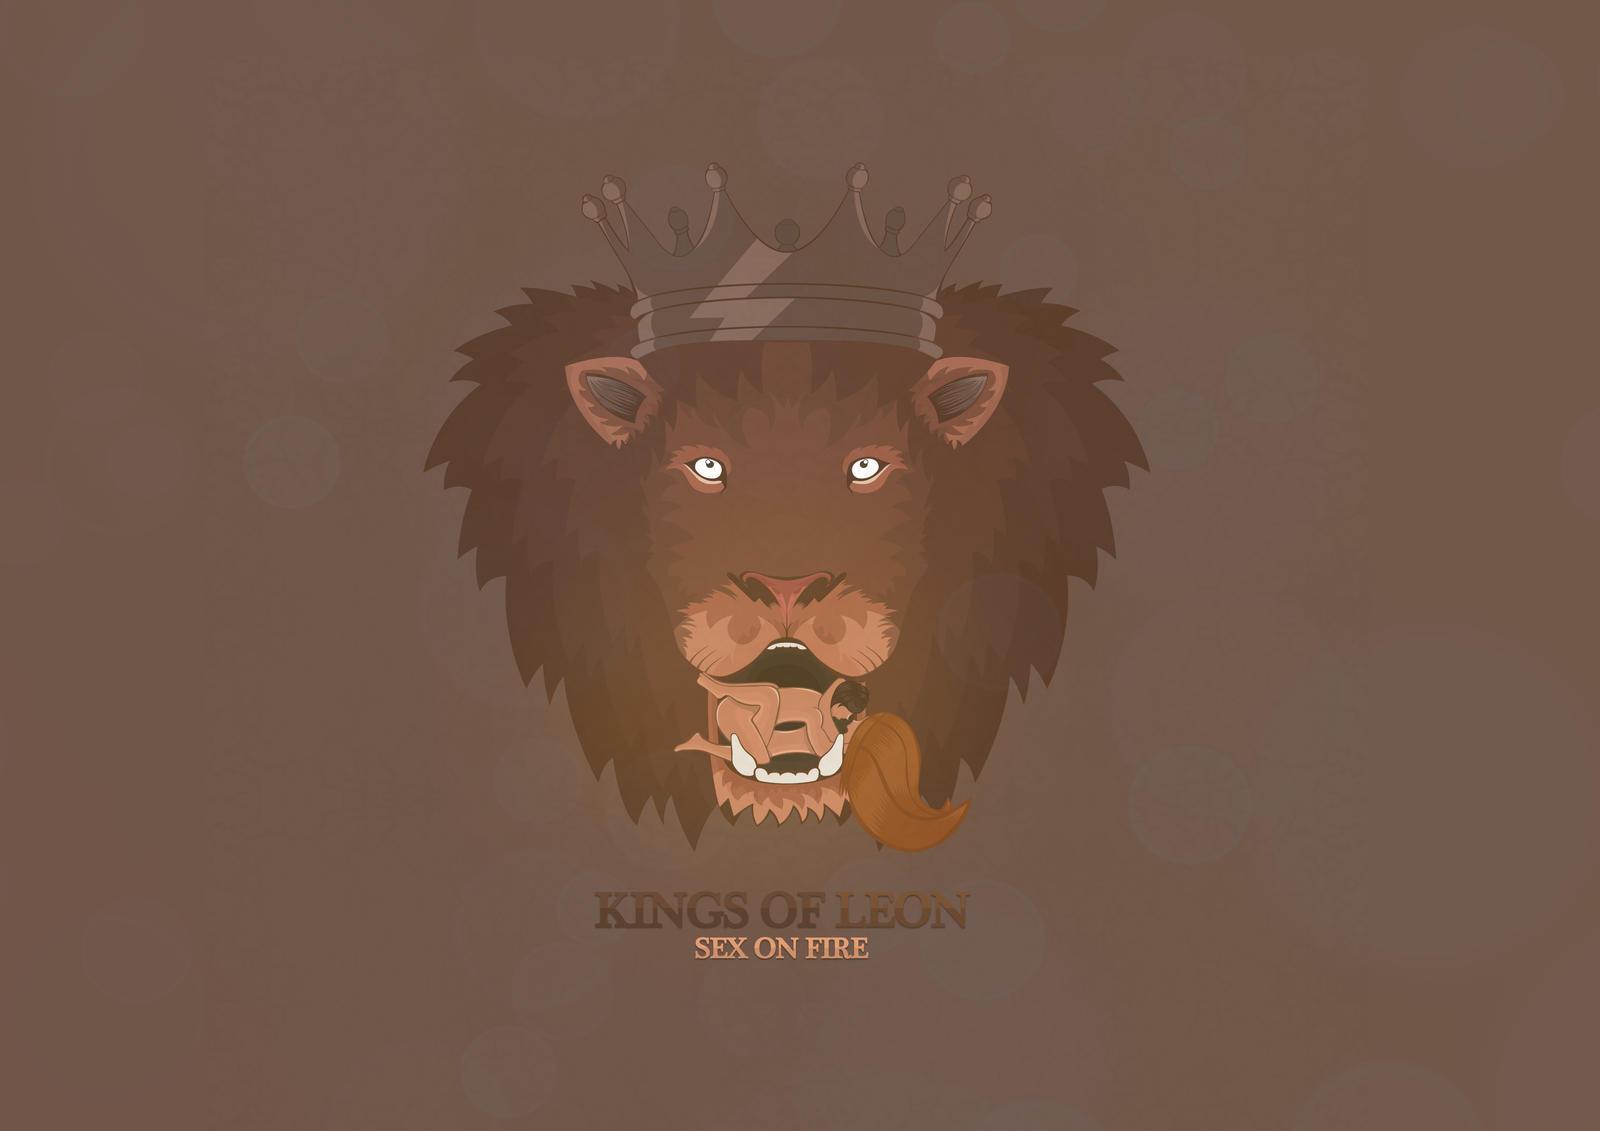 Kings of leon sex on fie opinion